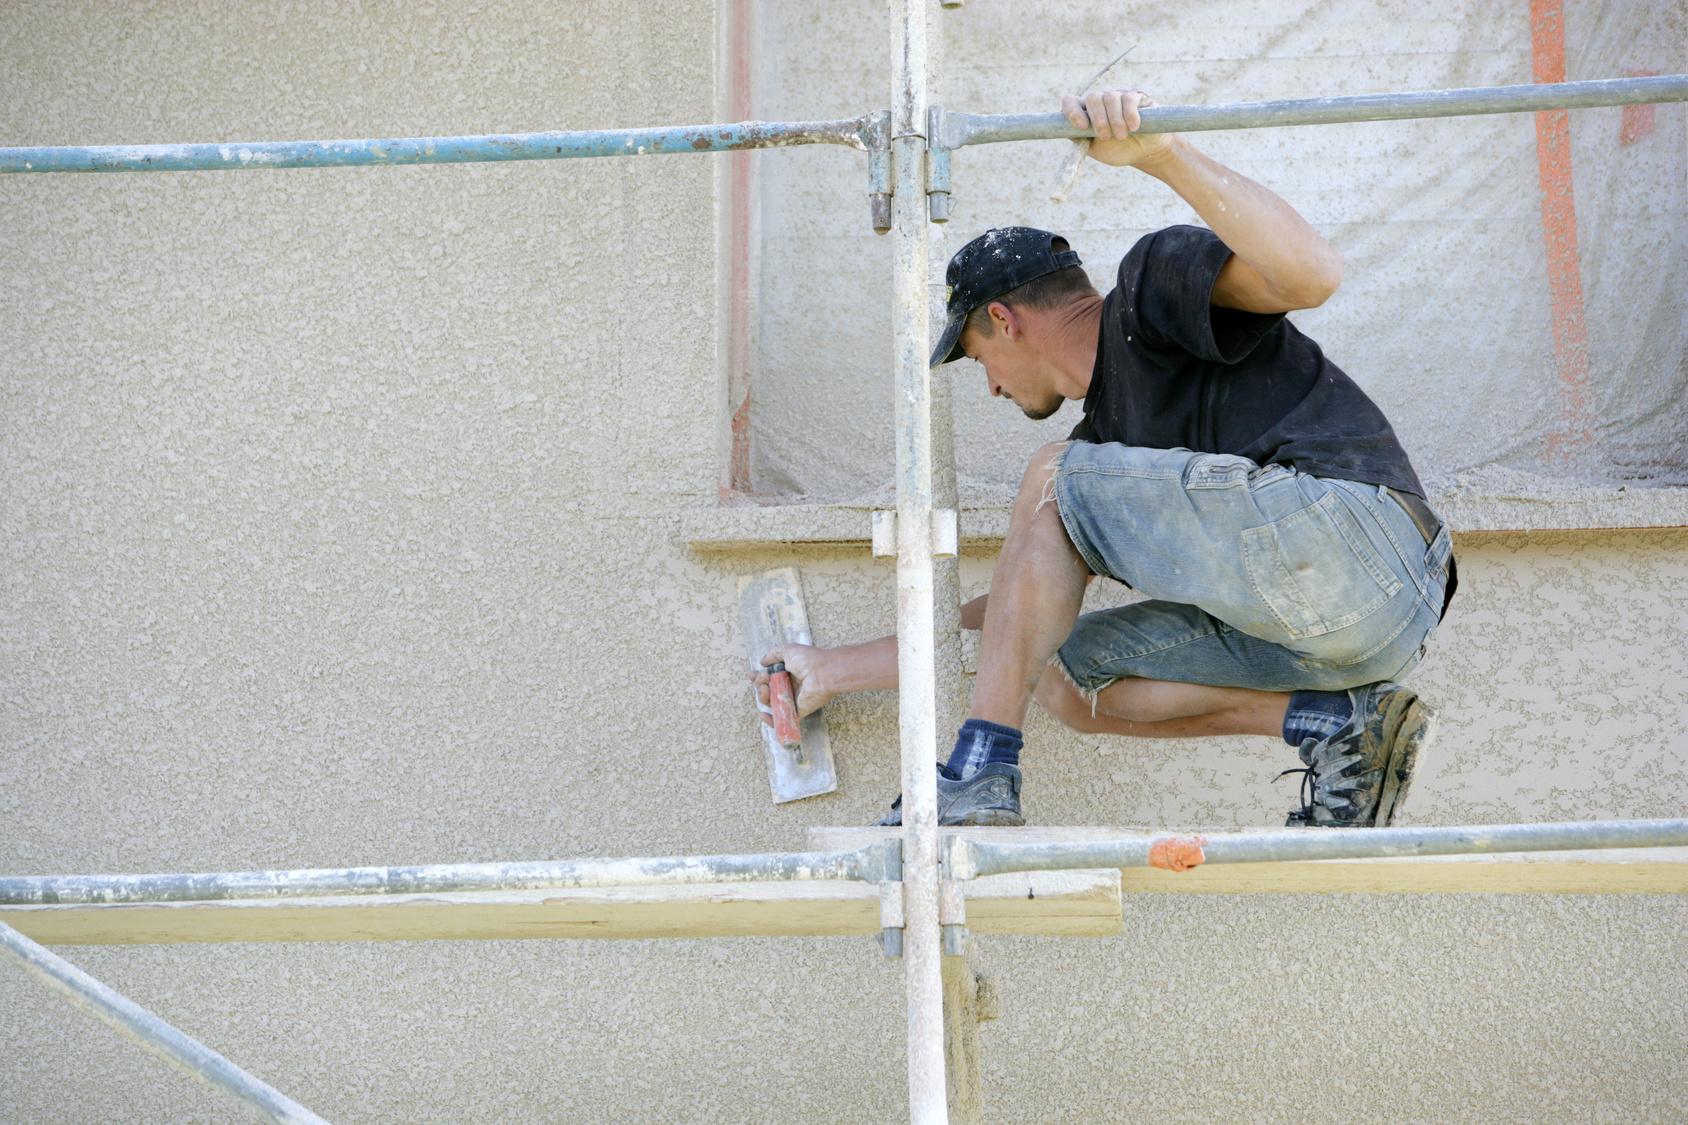 Prix peinture fa ade le tarif pour peindre une fa ade et for Prix facade maison 100m2